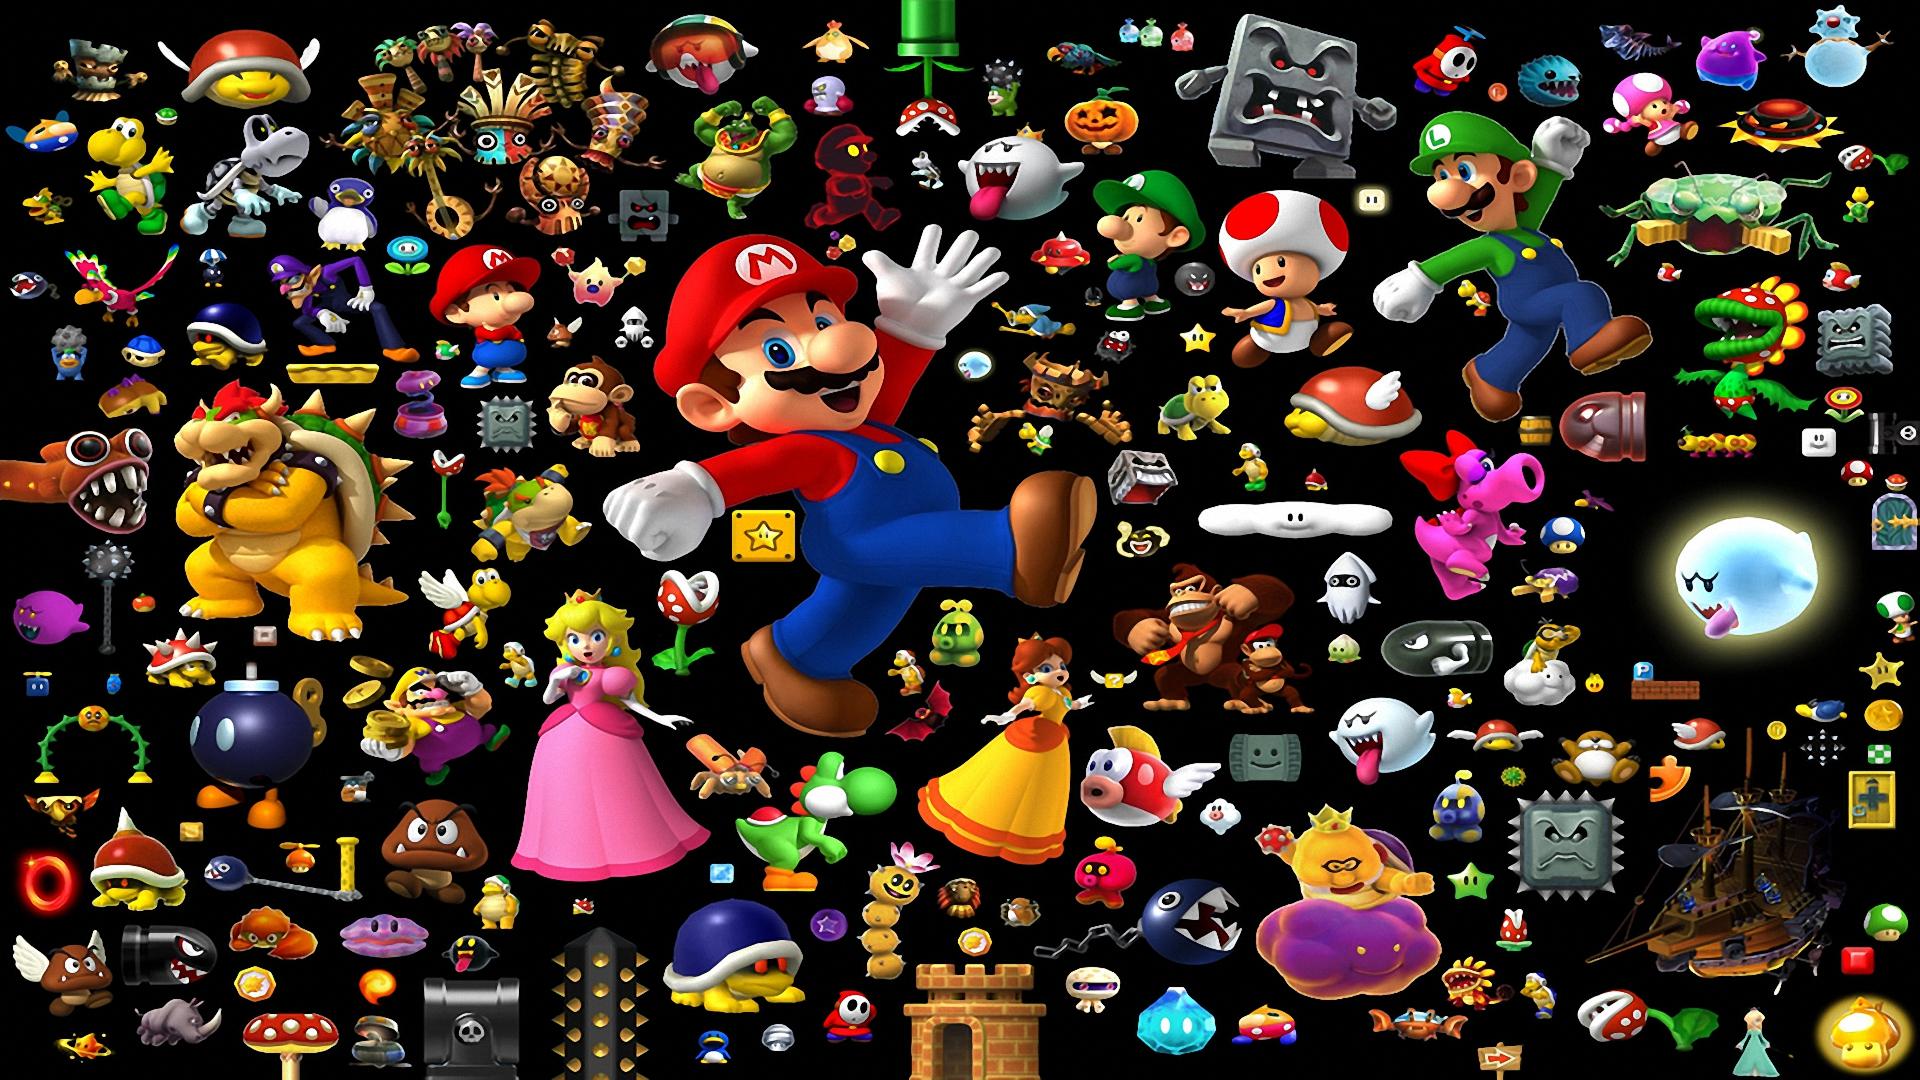 Super Mario All Stars Super Mario World Full Hd Fond D